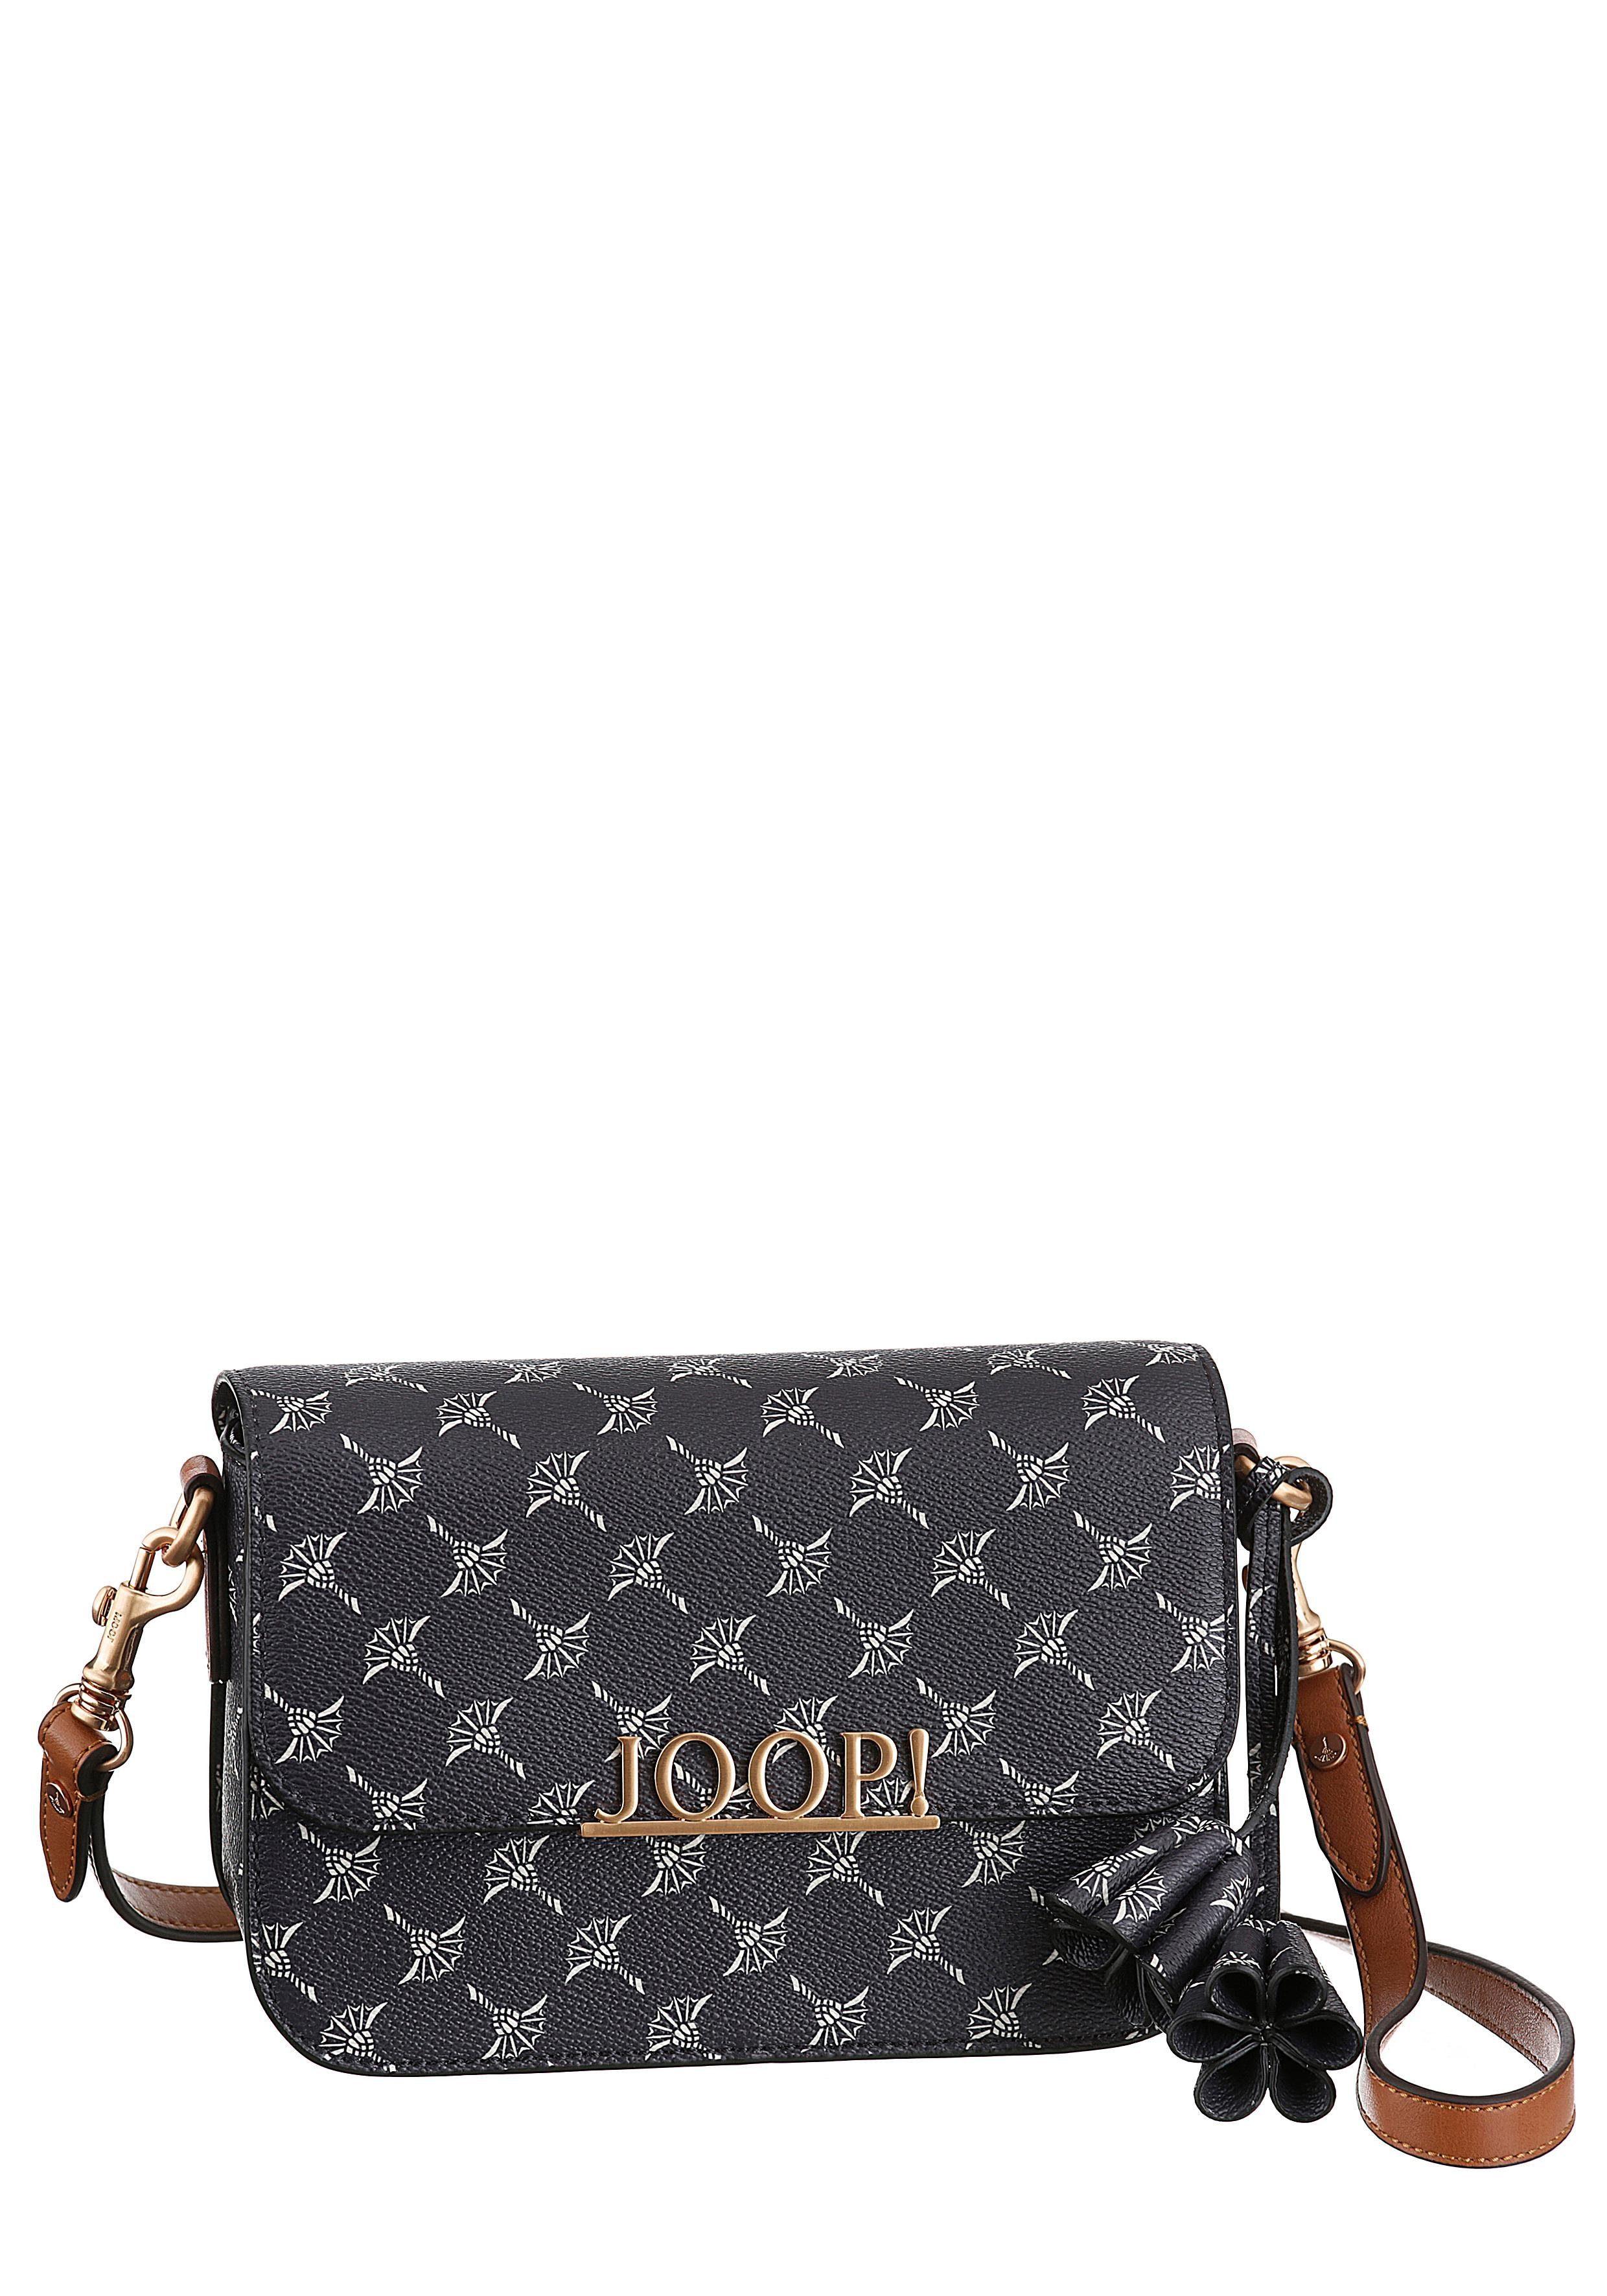 Joop! Mini Bag cortina uma shoulderbag xshf | Taschen > Handtaschen > Abendtaschen | Blau | Joop!